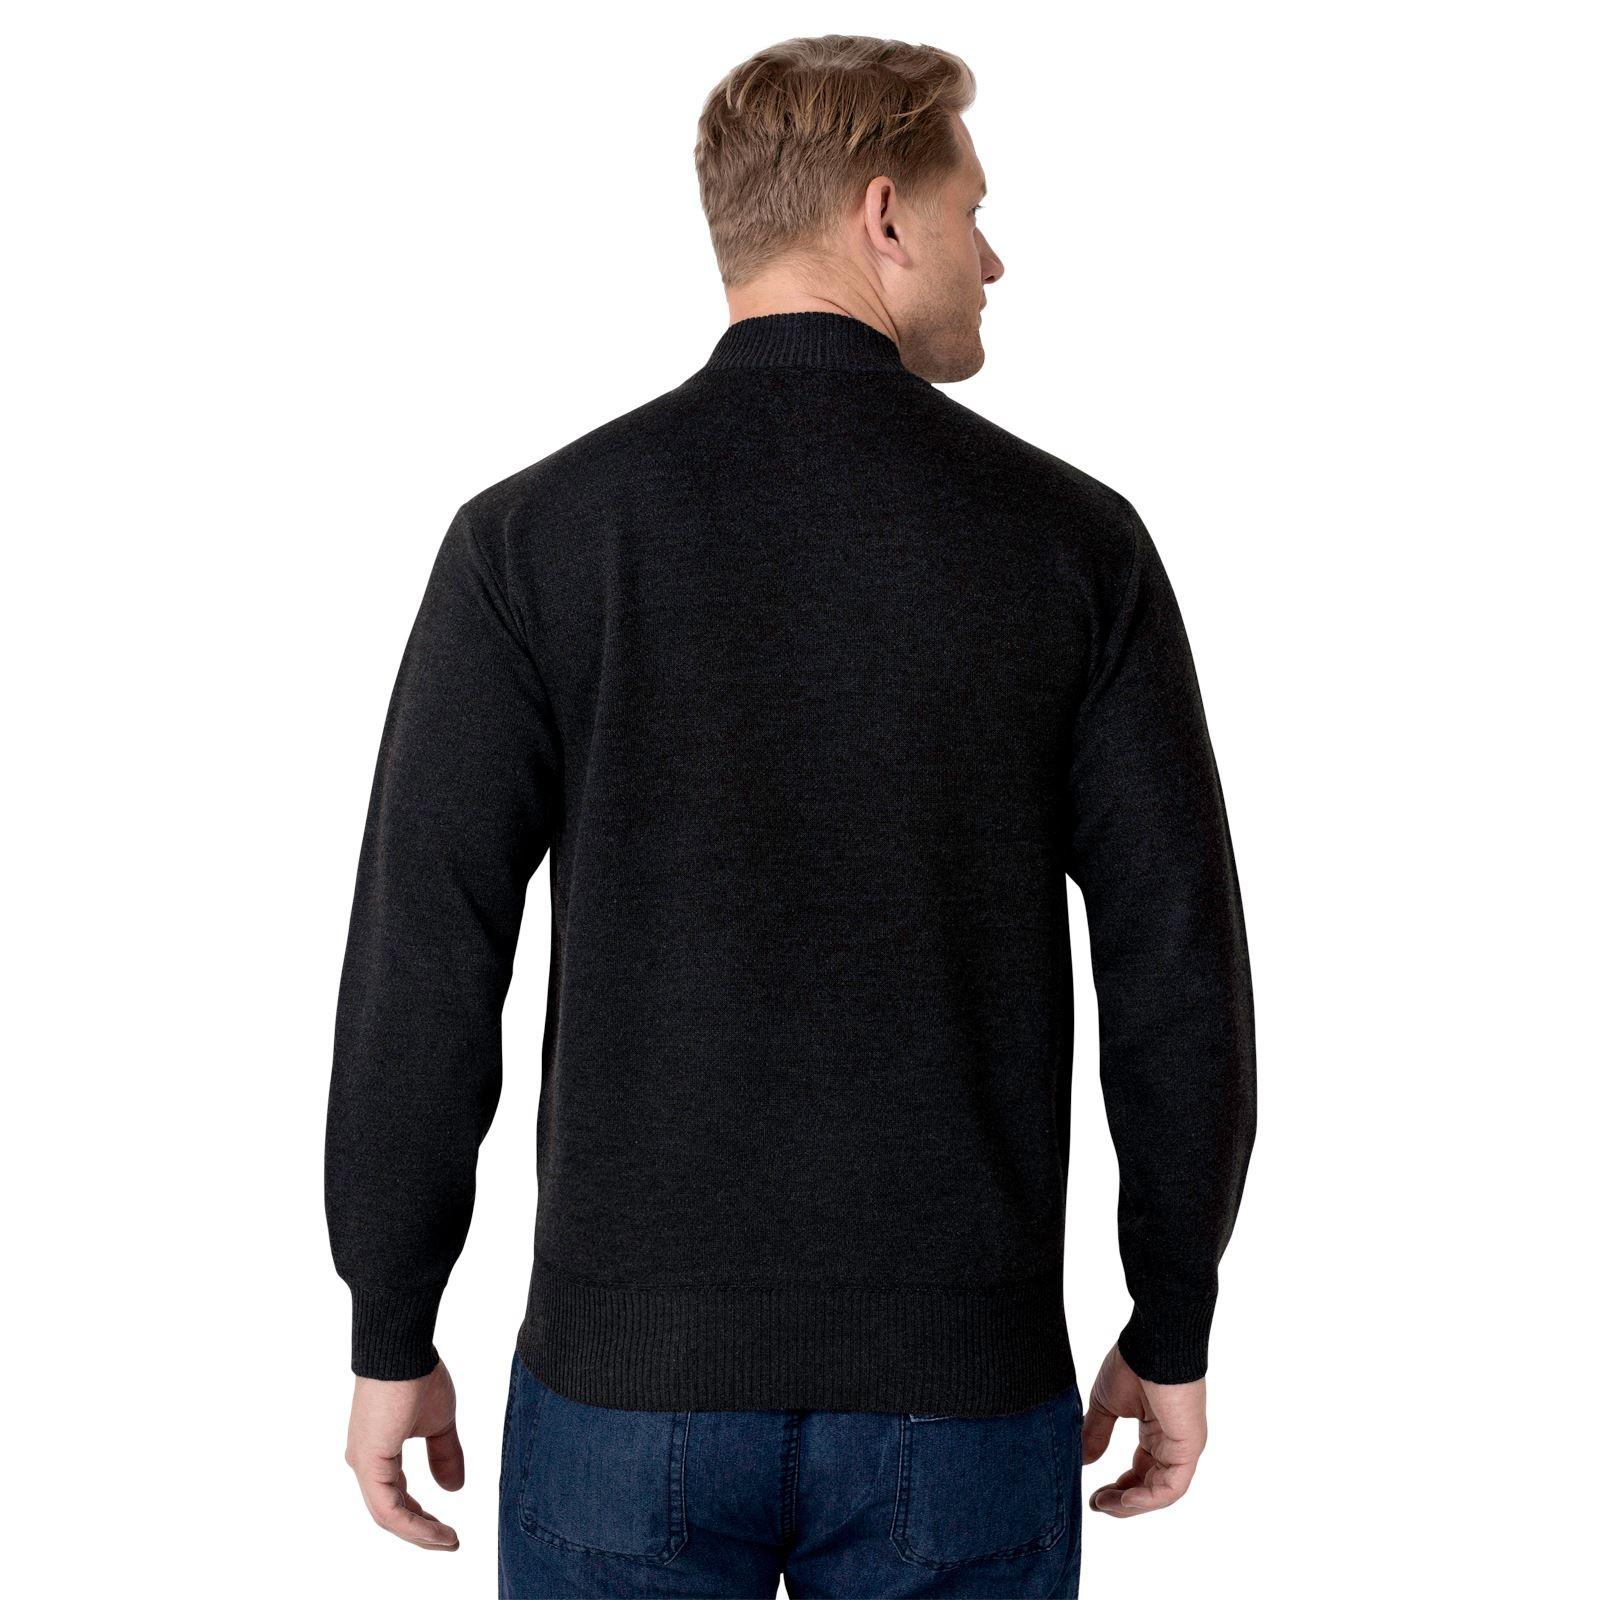 Men Half Zip Funnel Neck Plain Wool Knit Long Sleeve Jumper Sweater Pullover Top